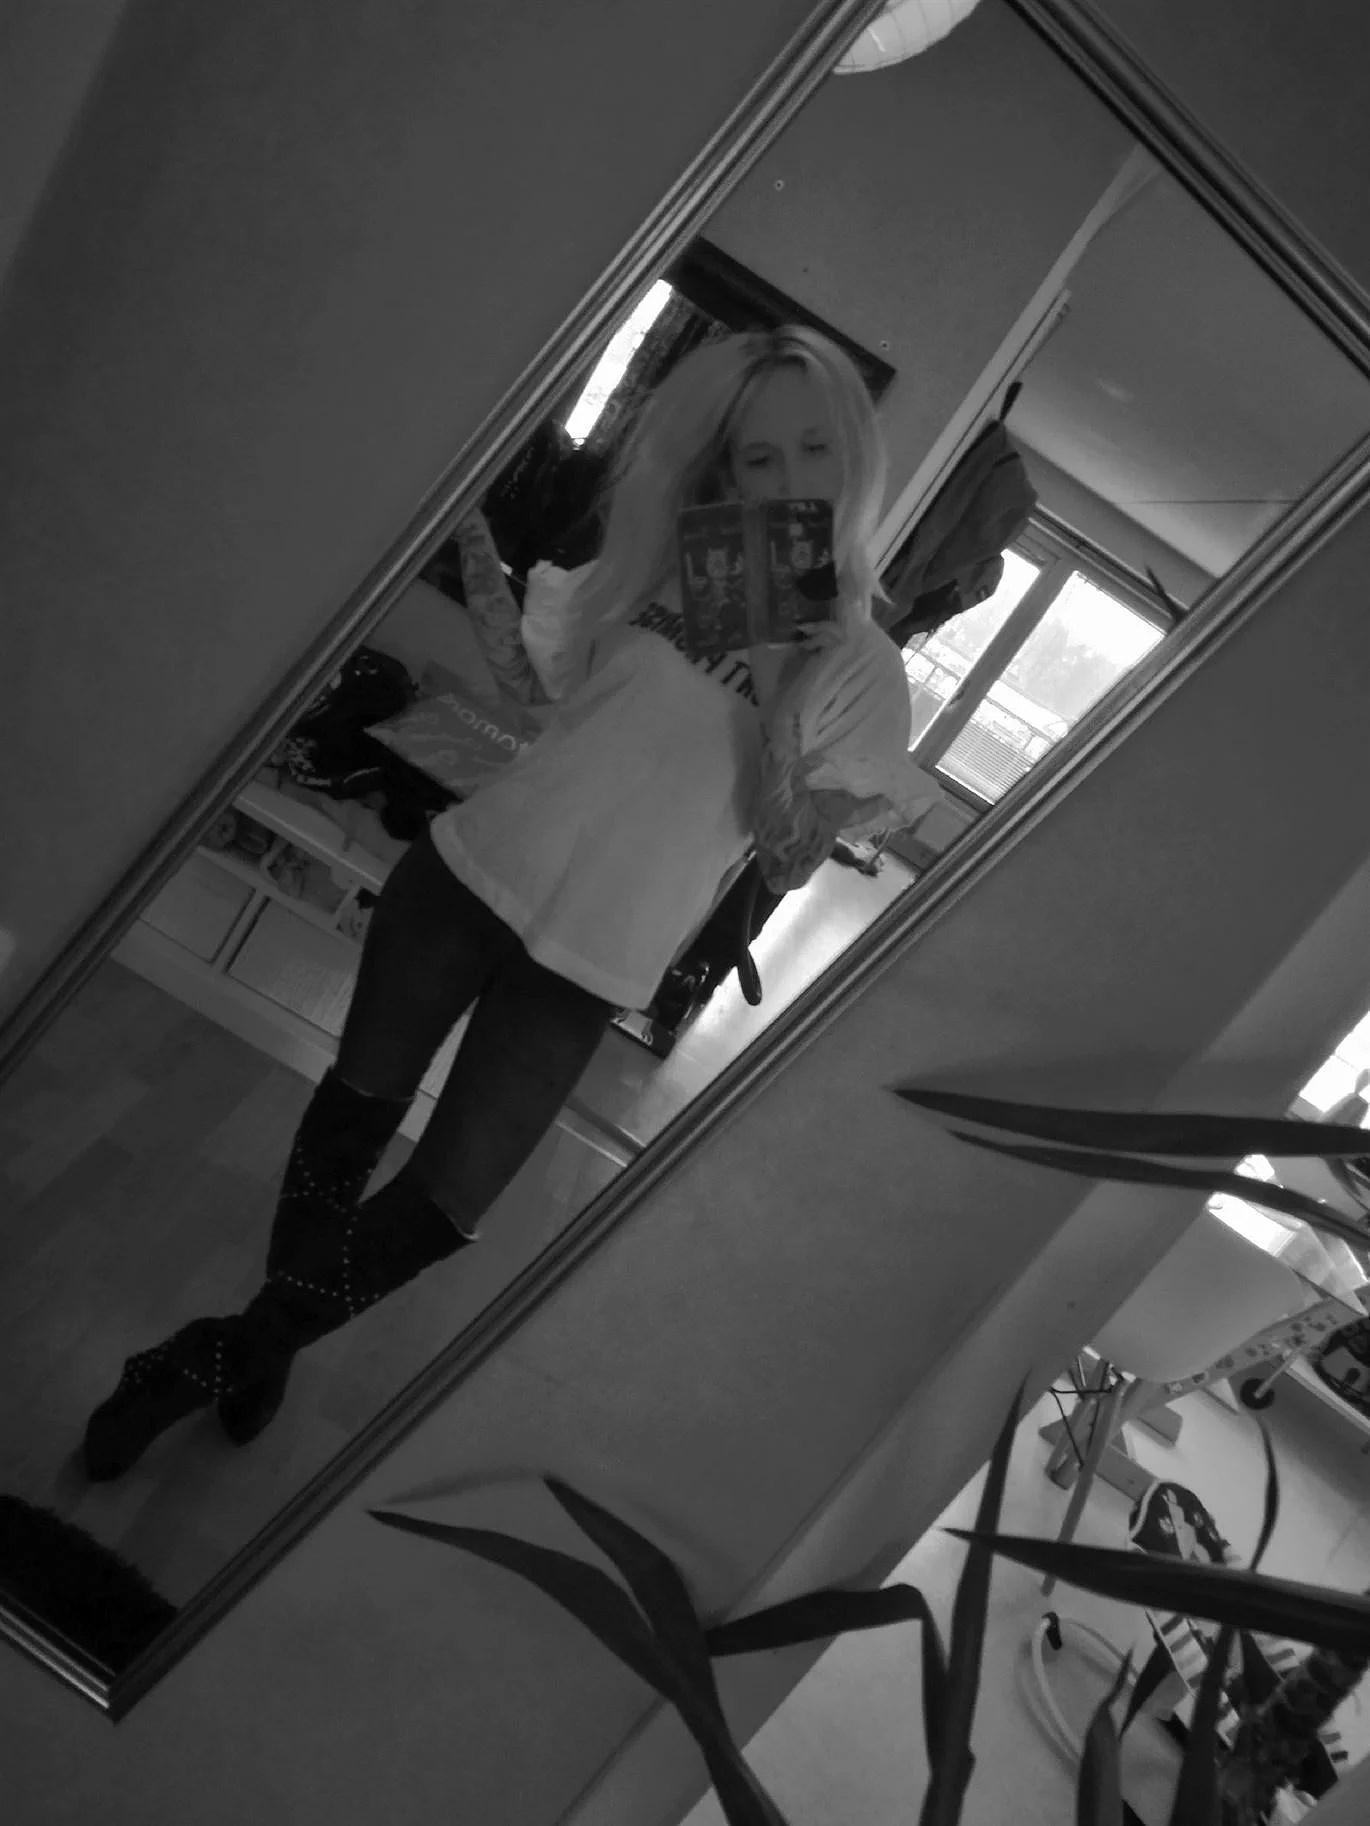 Helo lördag:)